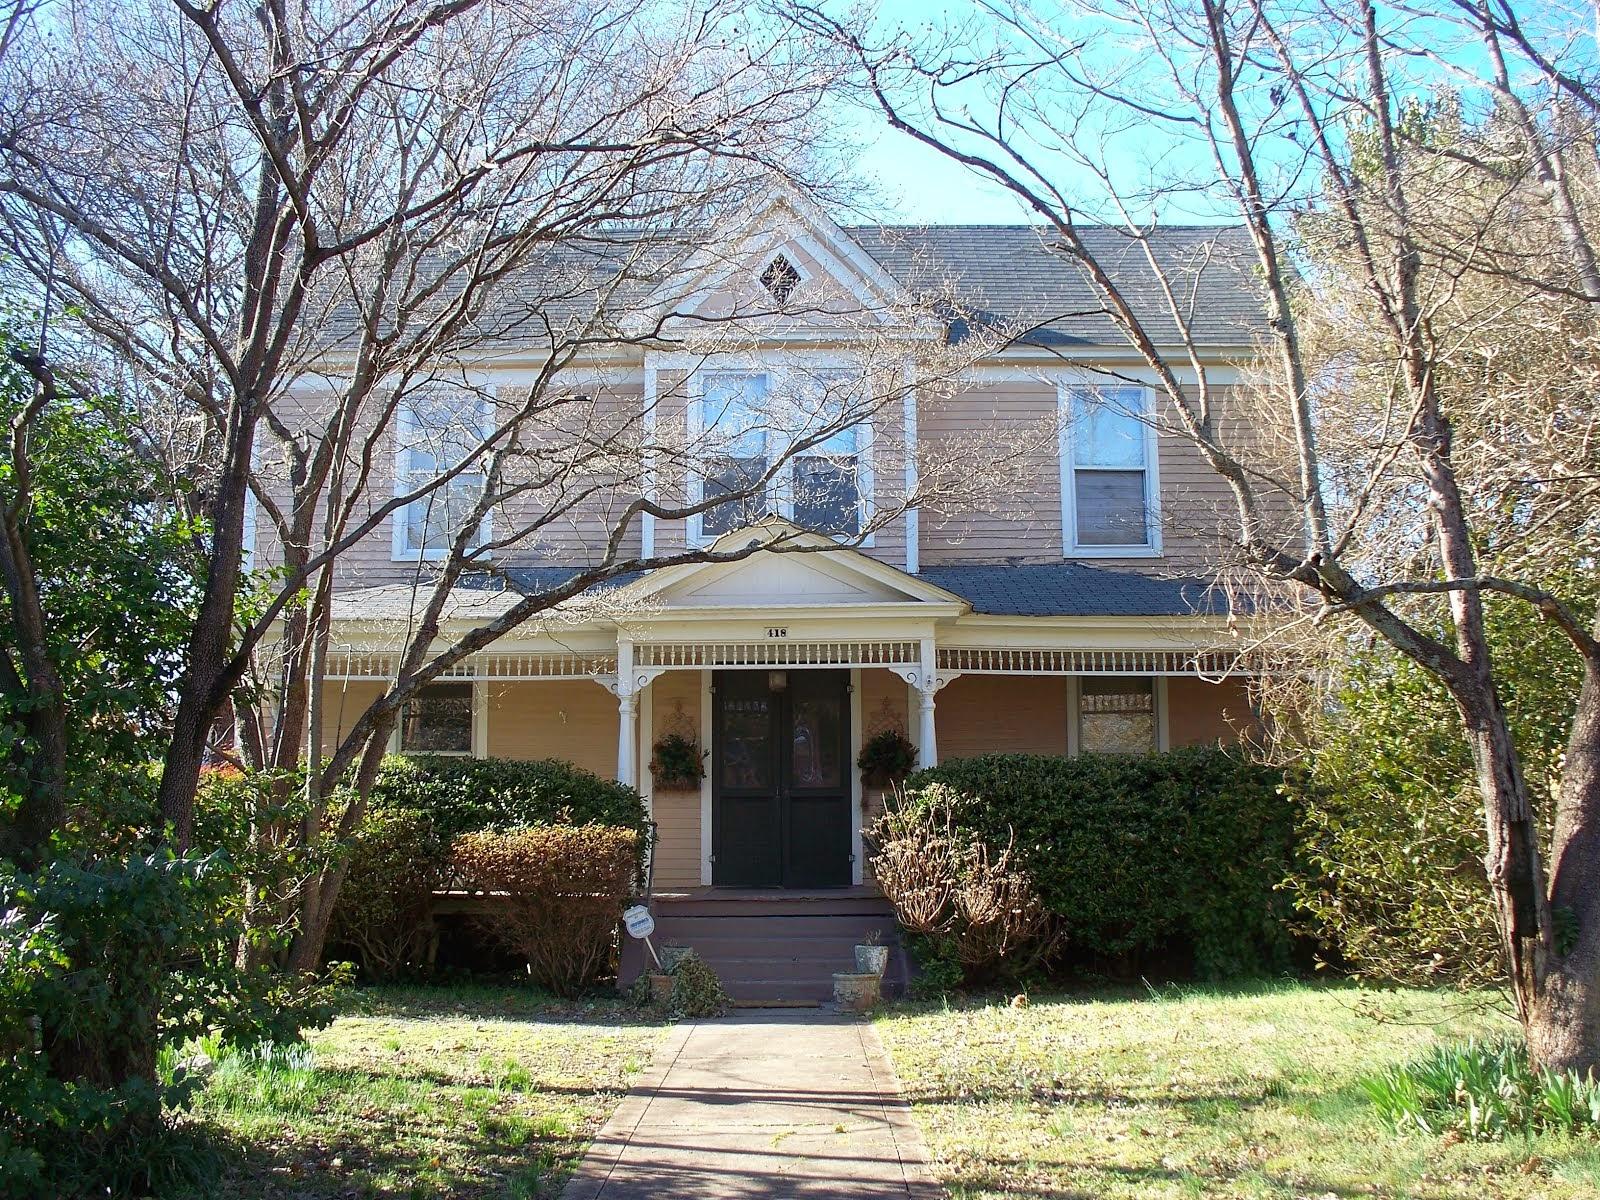 418 S. Ellis Street, Salisbury NC ~ CIRCA 1903 ~ $139,900